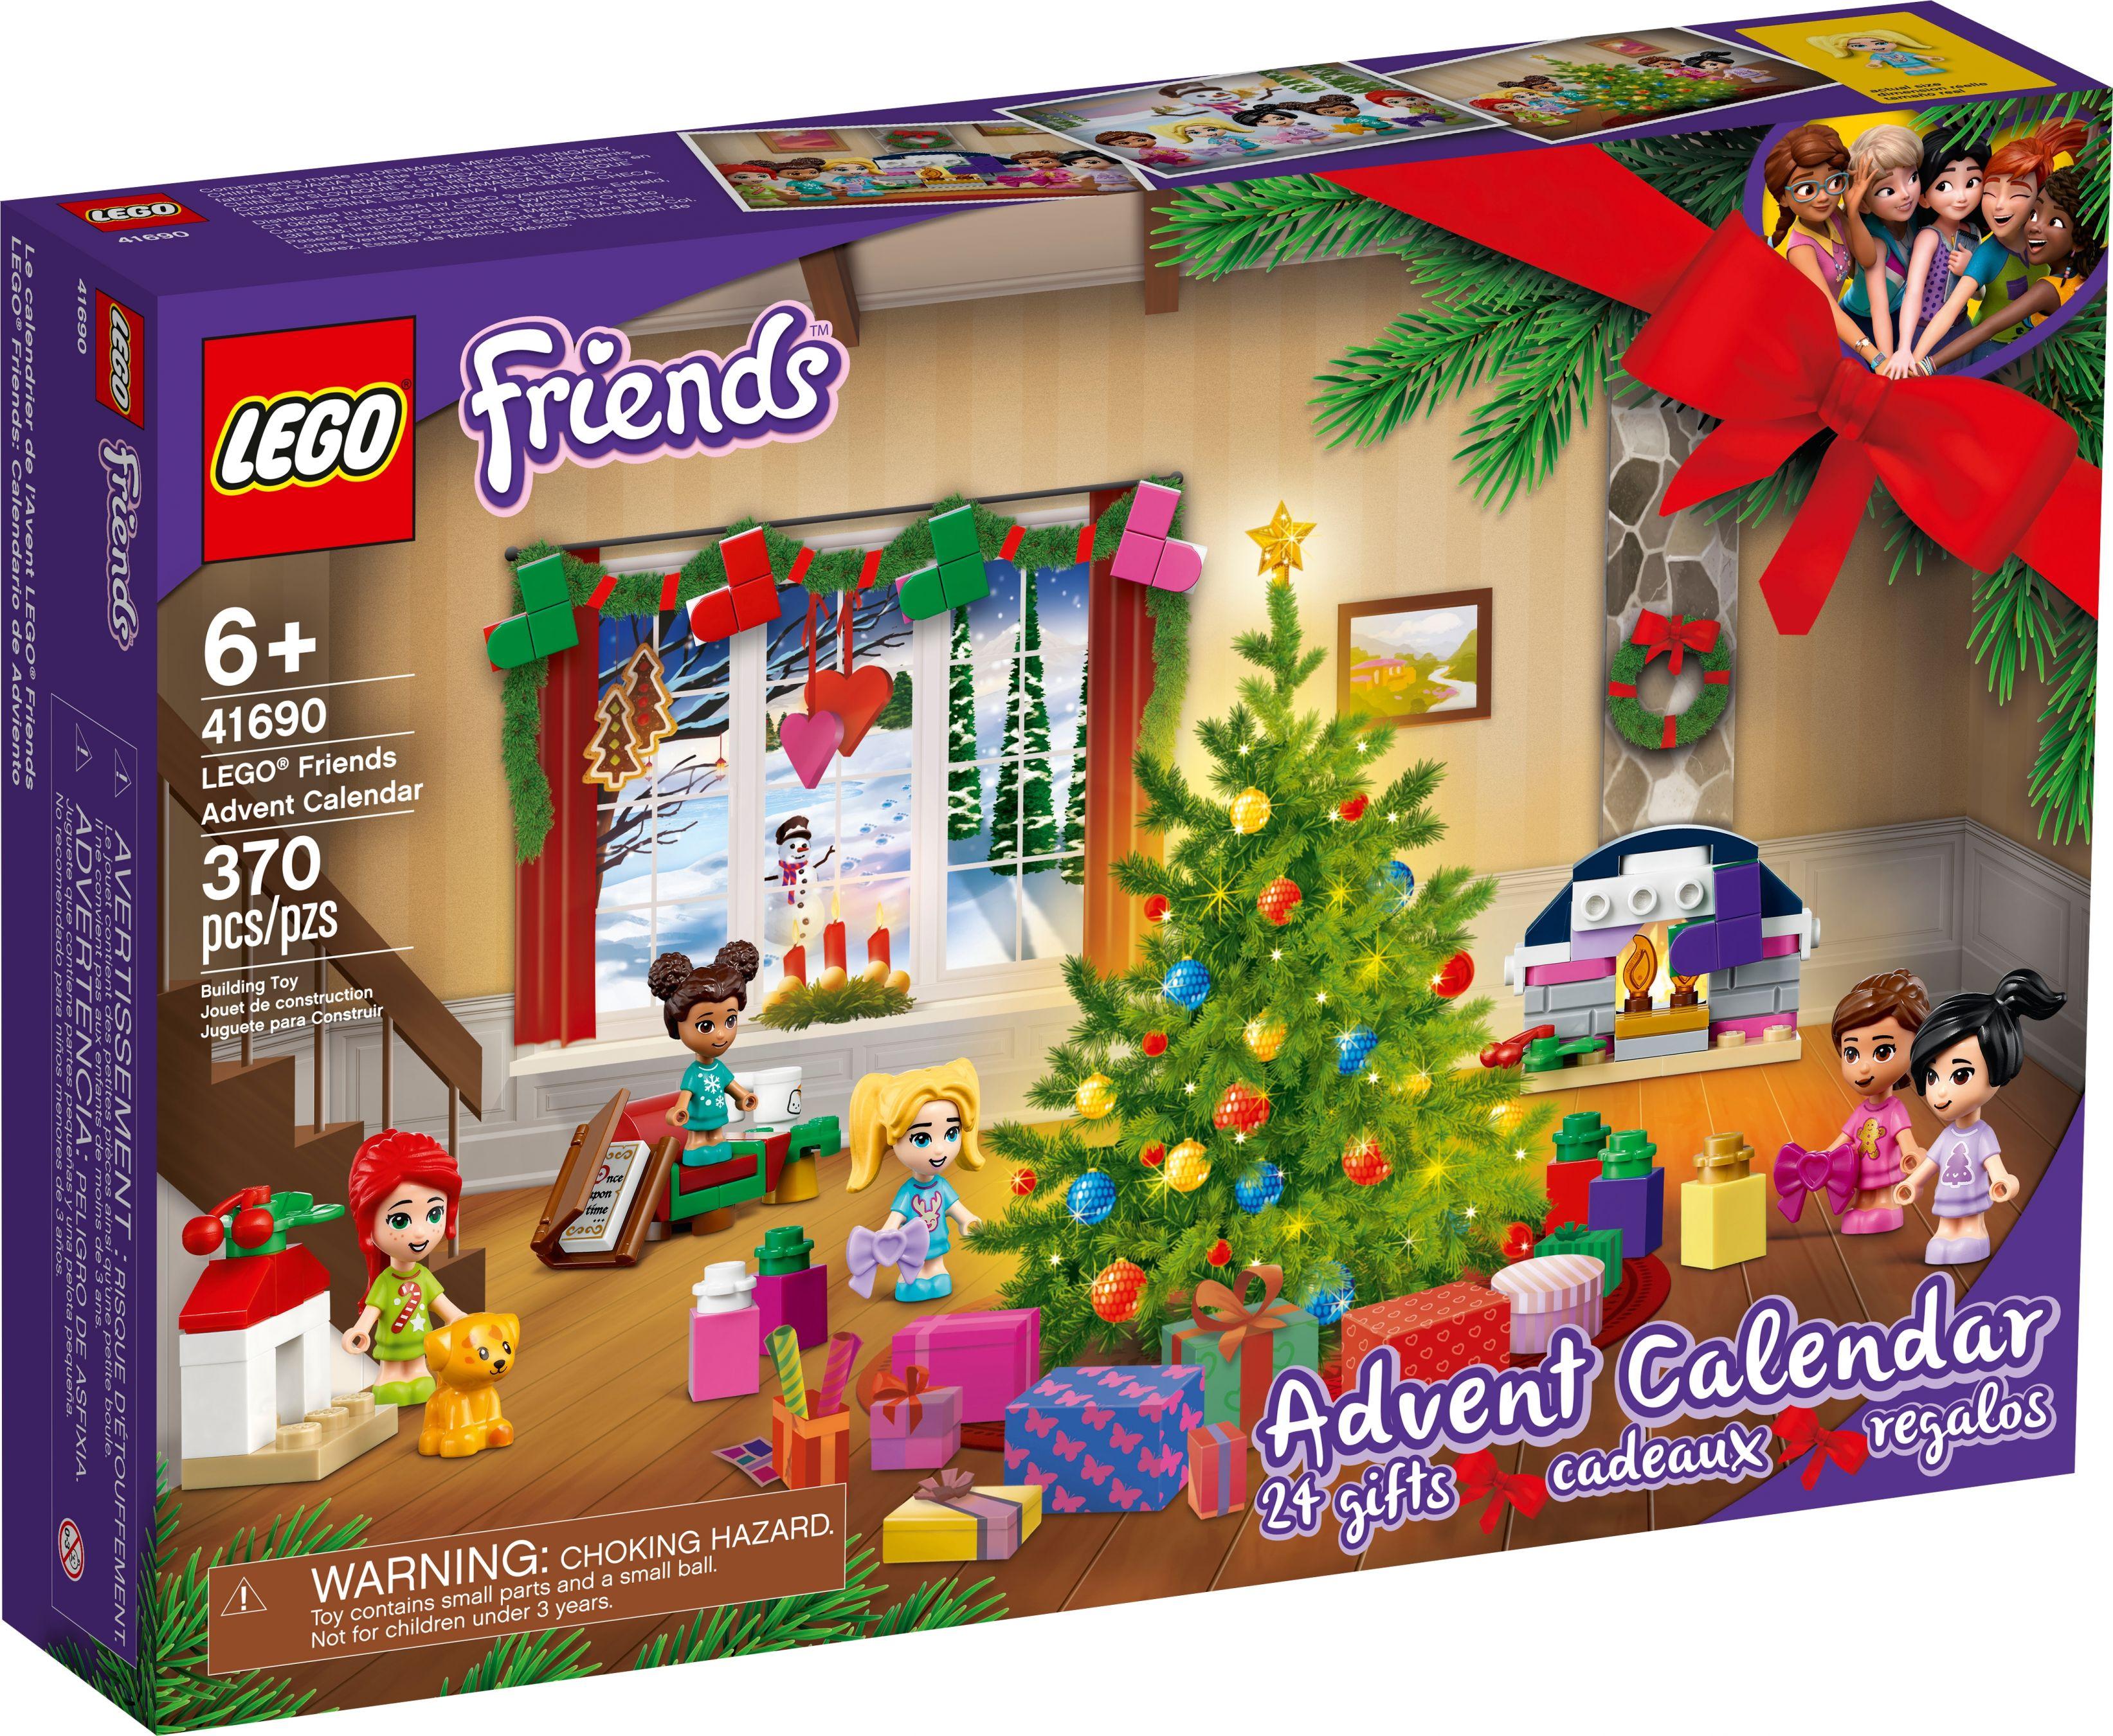 LEGO Friends Adventskalender 2021